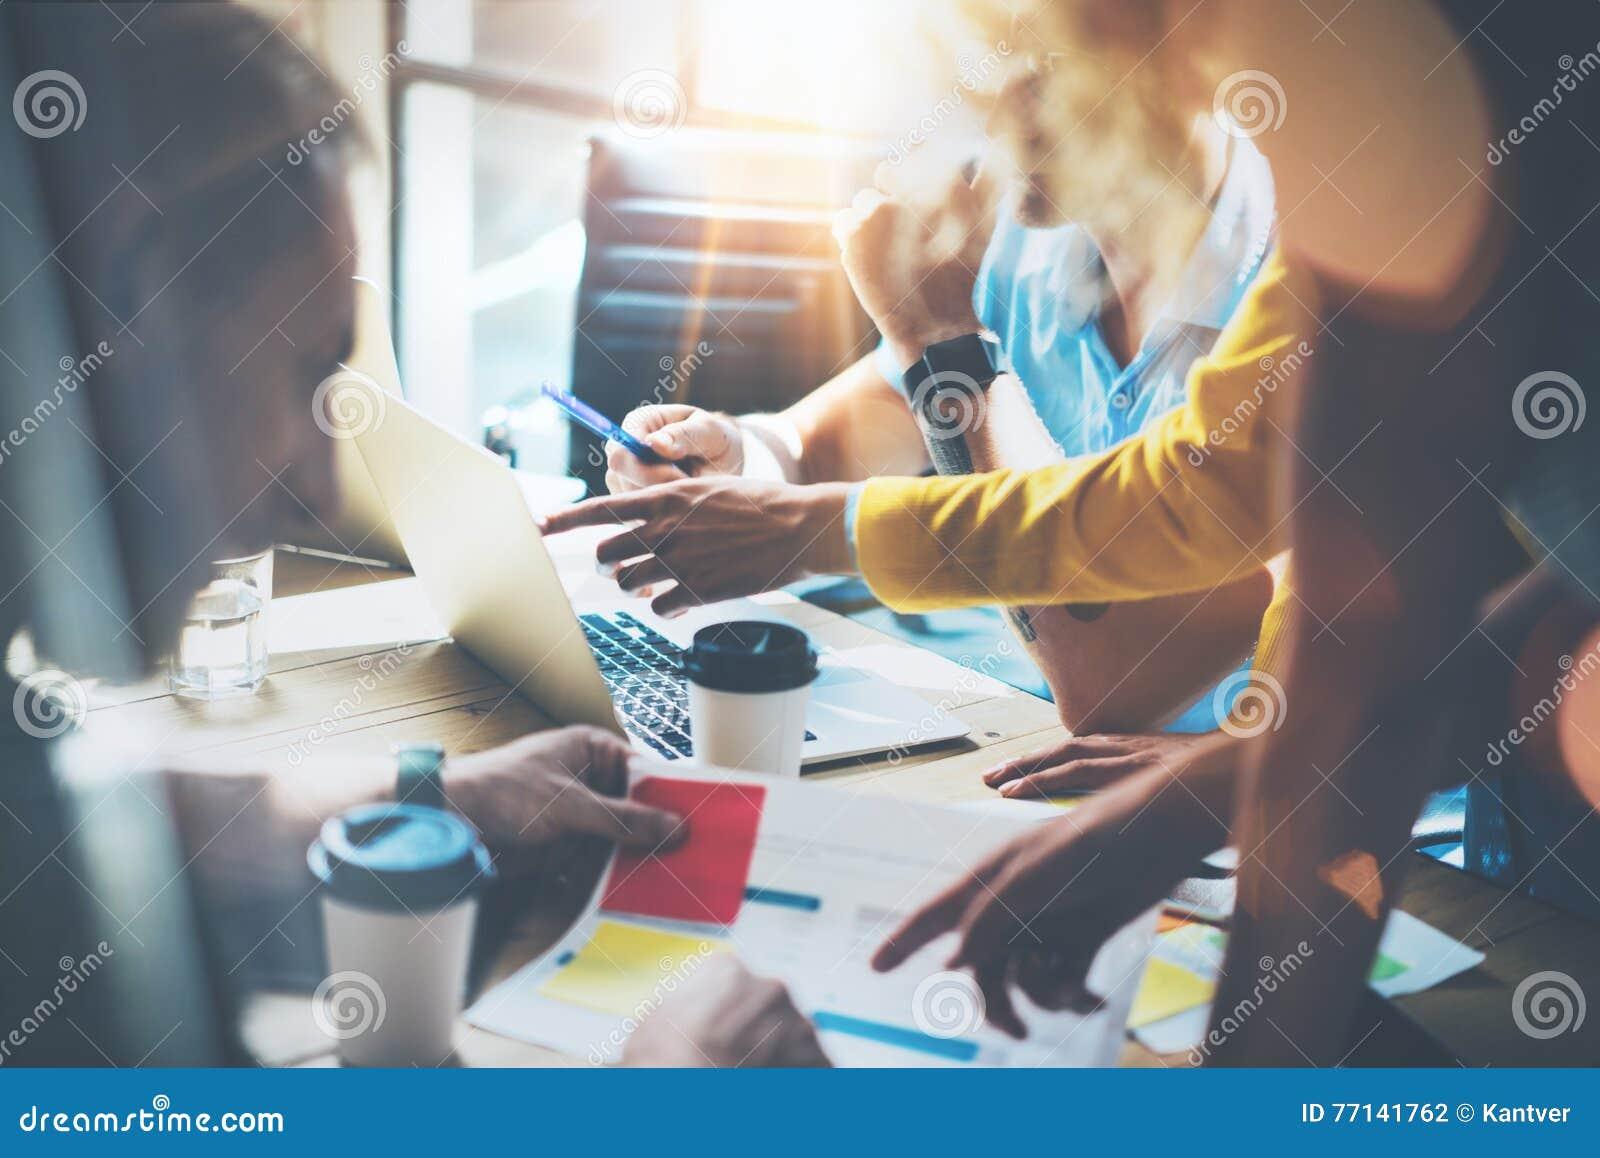 BarngruppCoworkers som gör stora affärsbeslut MarknadsföringsTeam Discussion Corporate Work Concept studio nytt